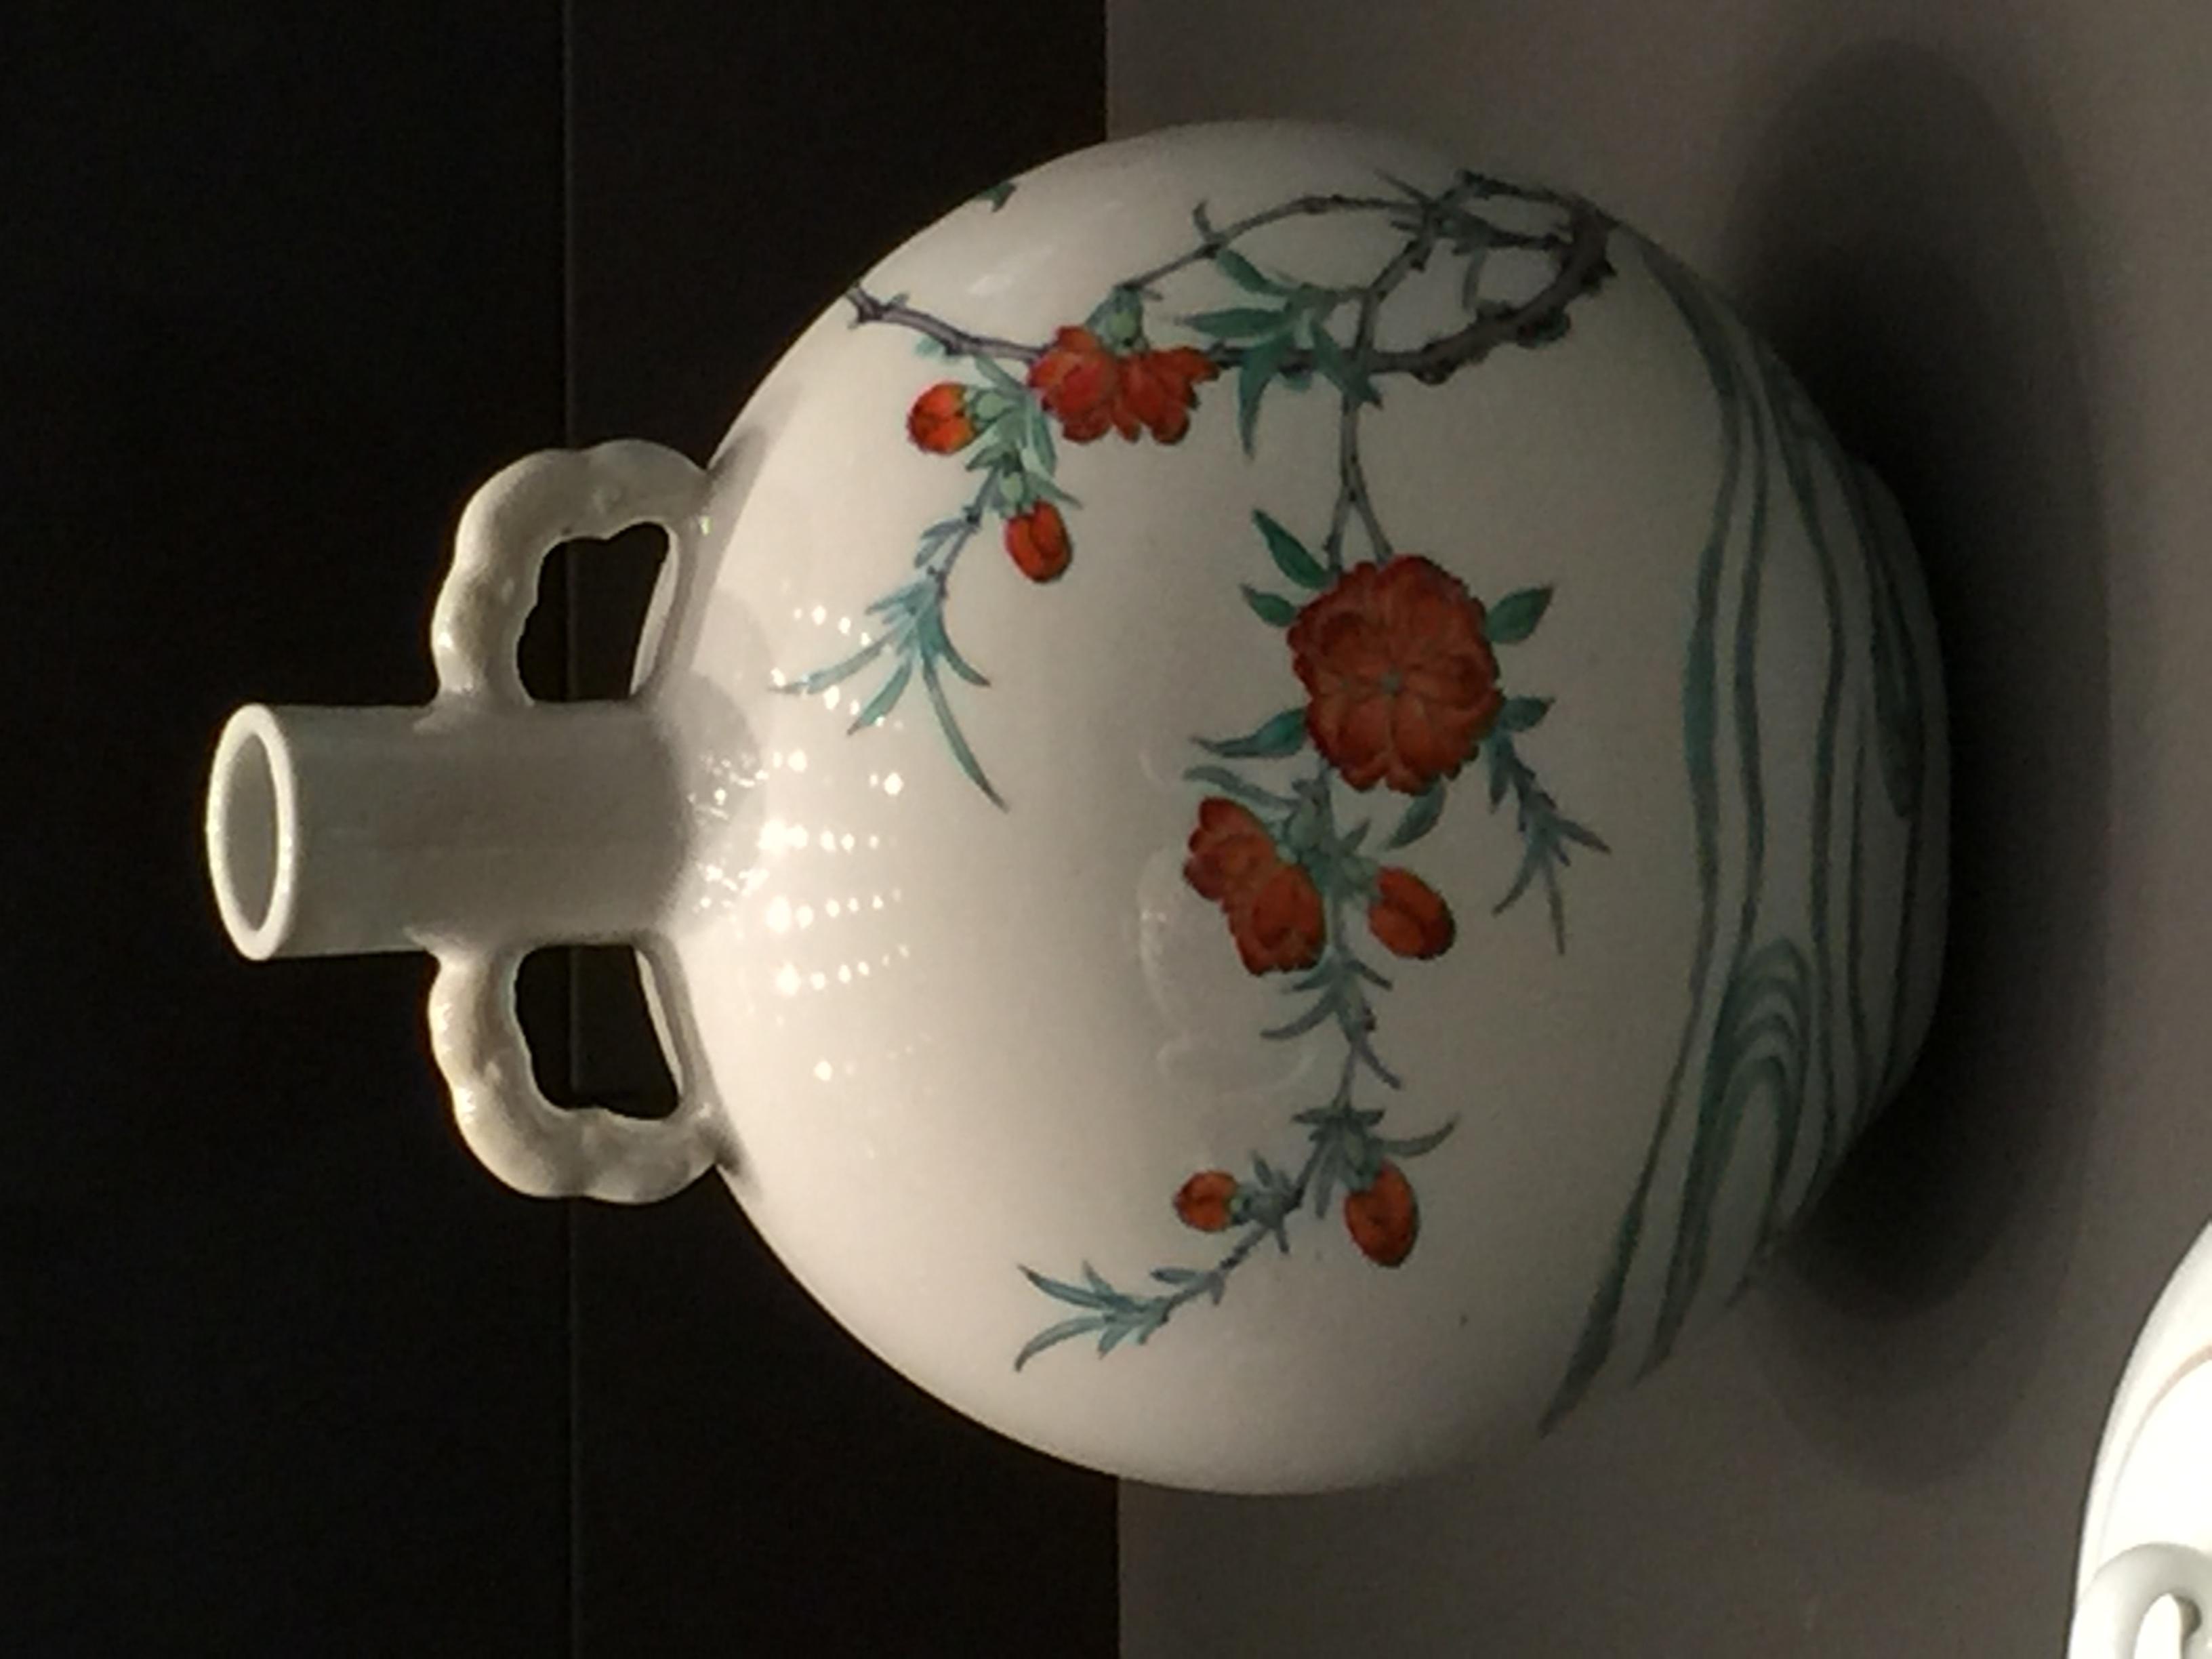 Chinese-Porcelain-British-Museum-Percival-David-jessewaugh.com-112.jpg